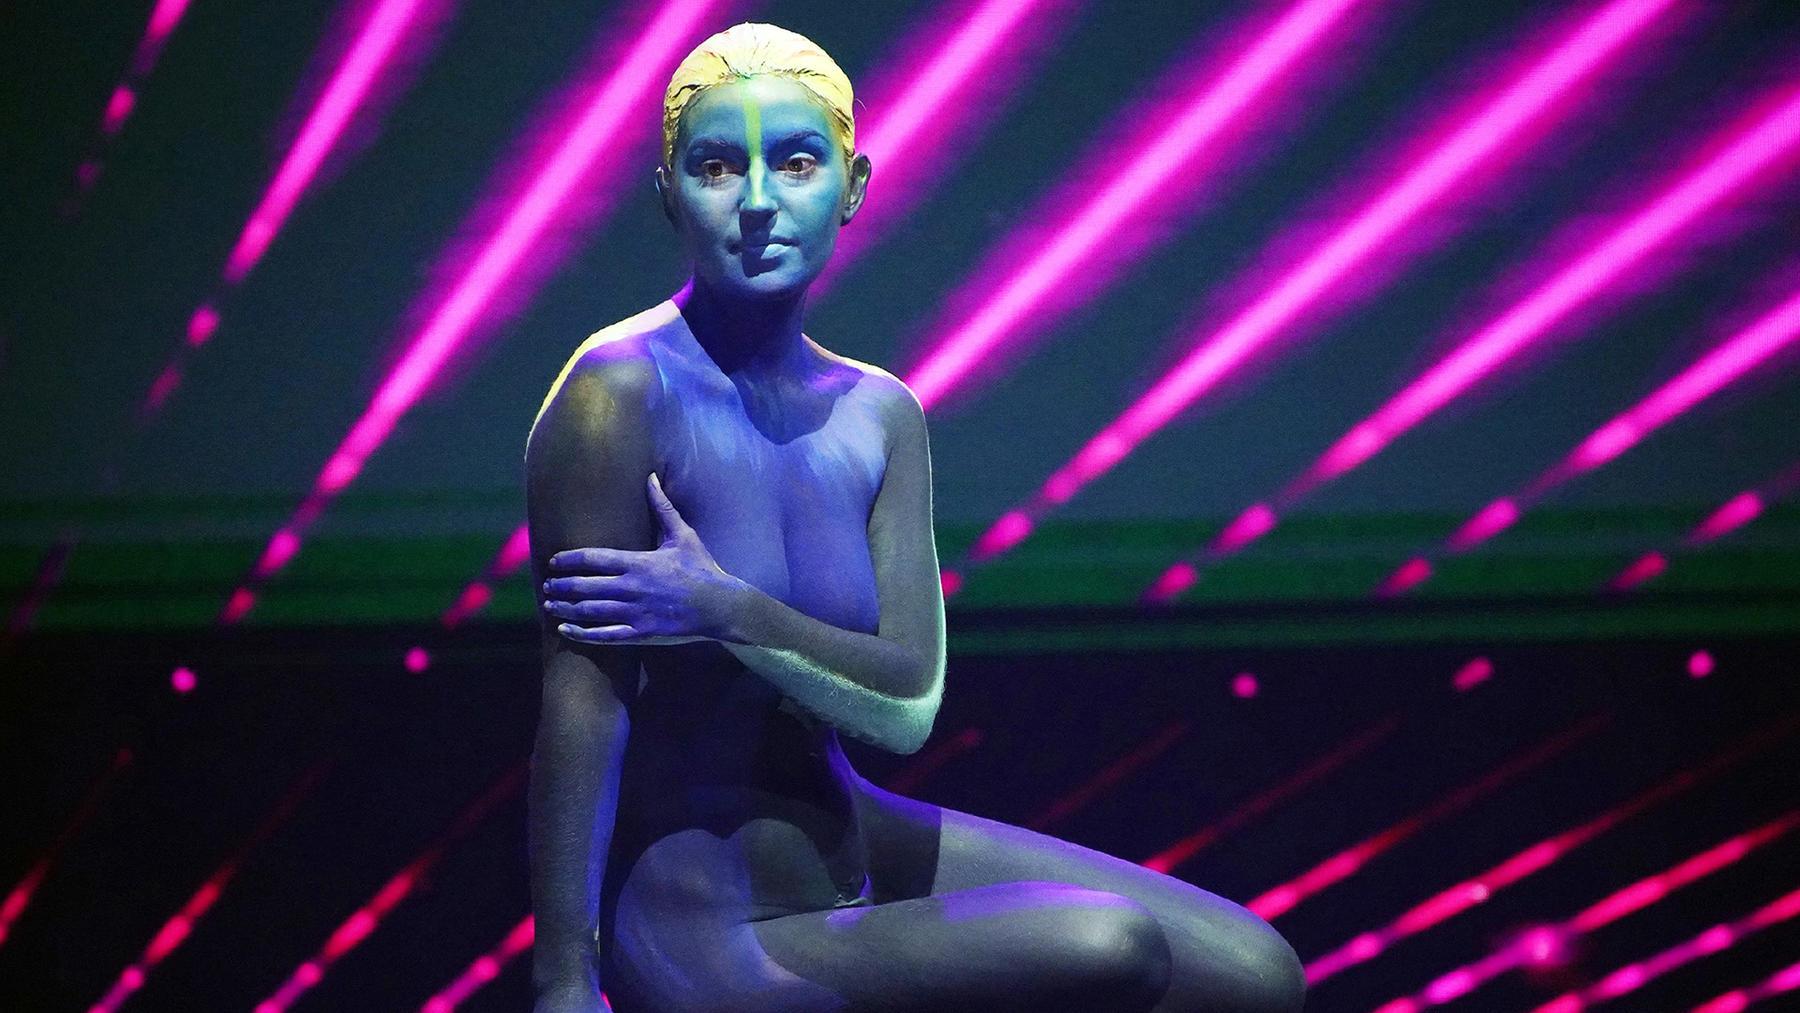 Bodypainter, LED-Show mit Tanz und Akrobatik